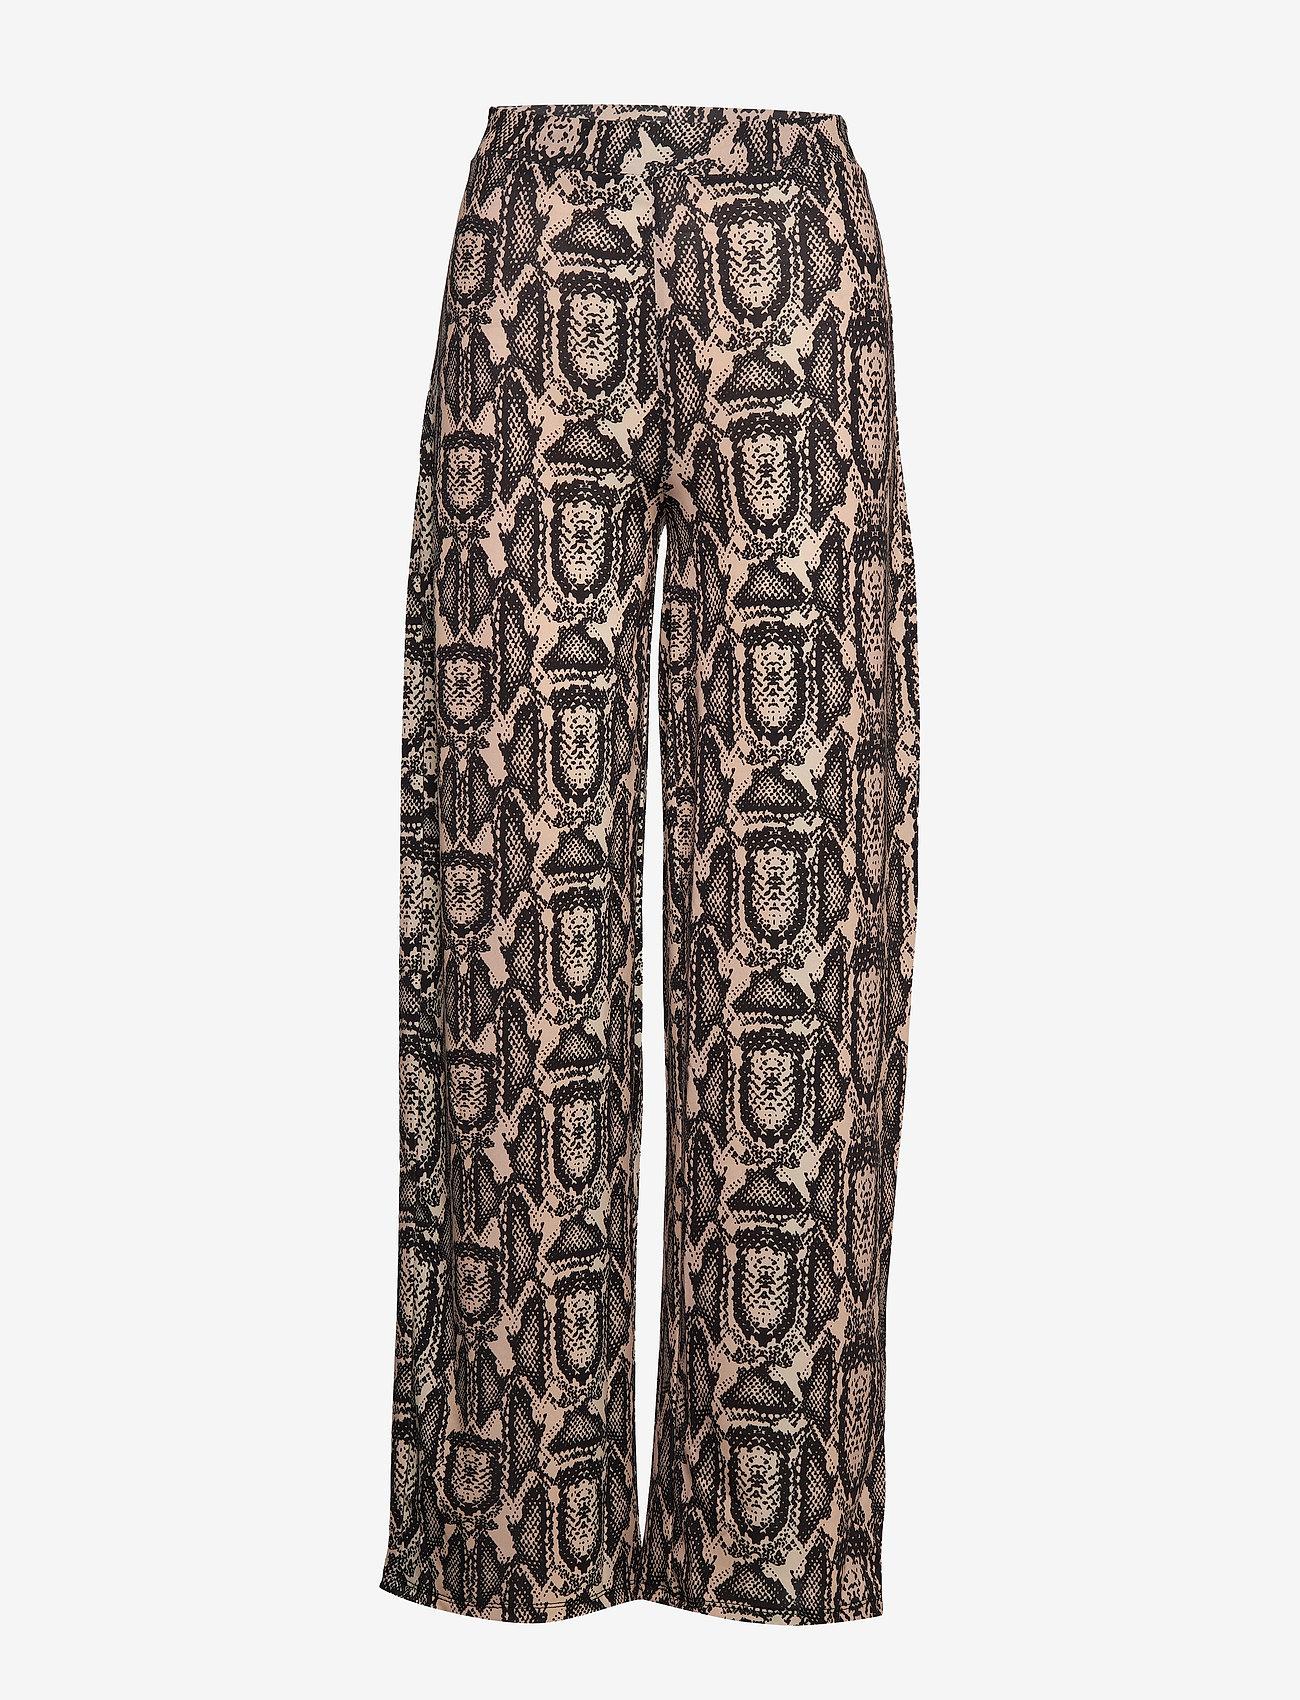 Ivyrevel - SHINY WIDE LEG PANTS - pantalons larges - beige snake - 0